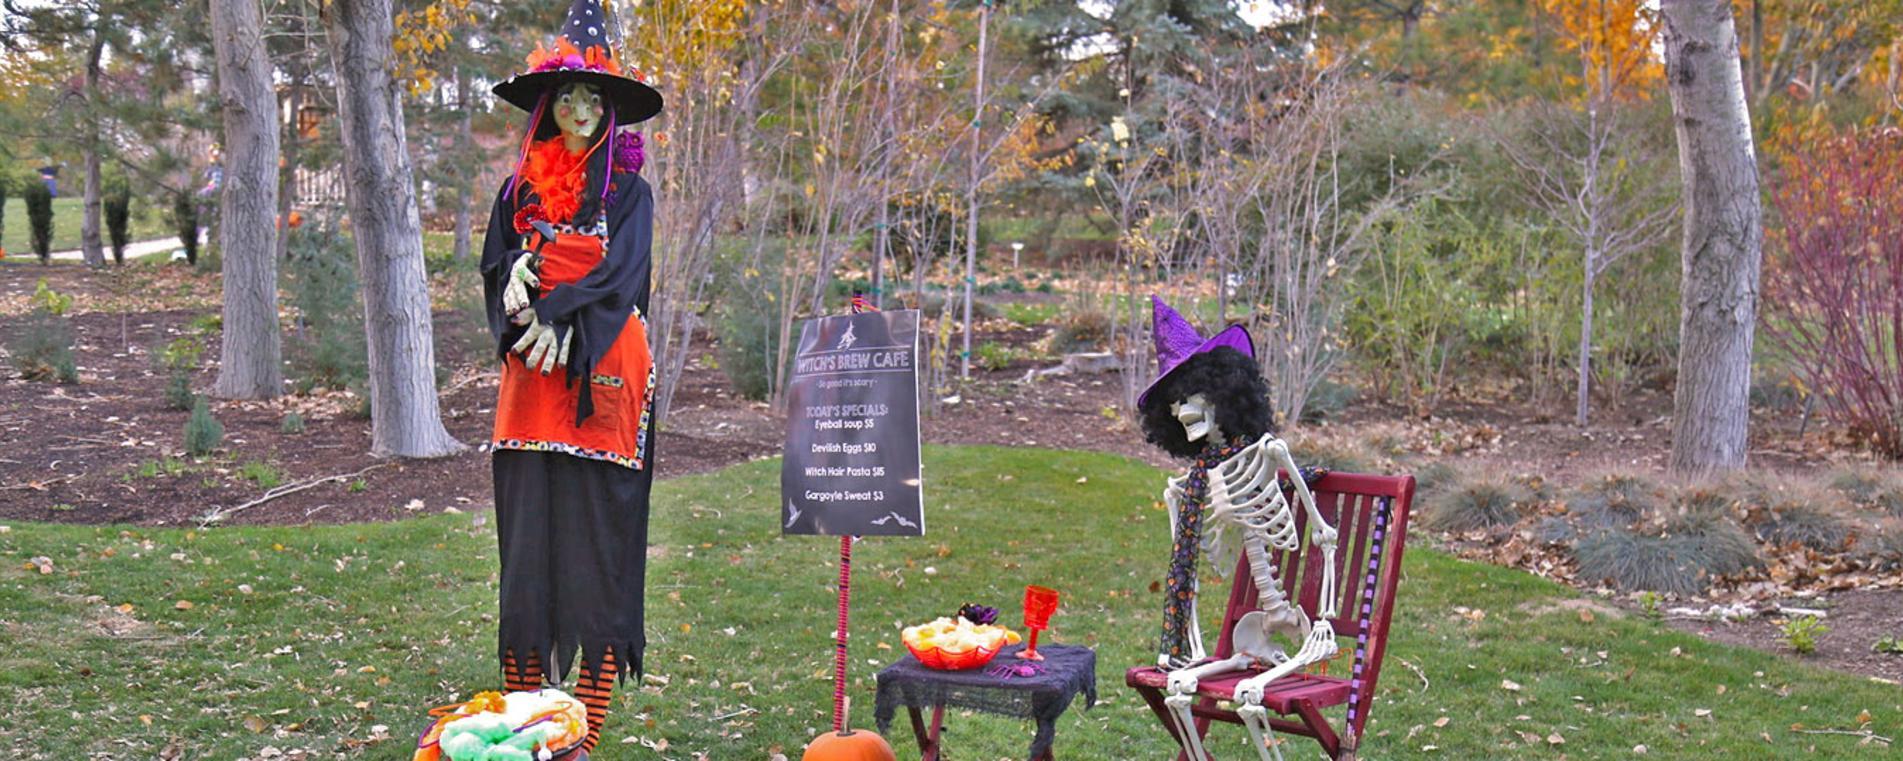 Halloween Events Utah County 2020 20+ Halloween Events To Get Spooked | Explore Utah Valley